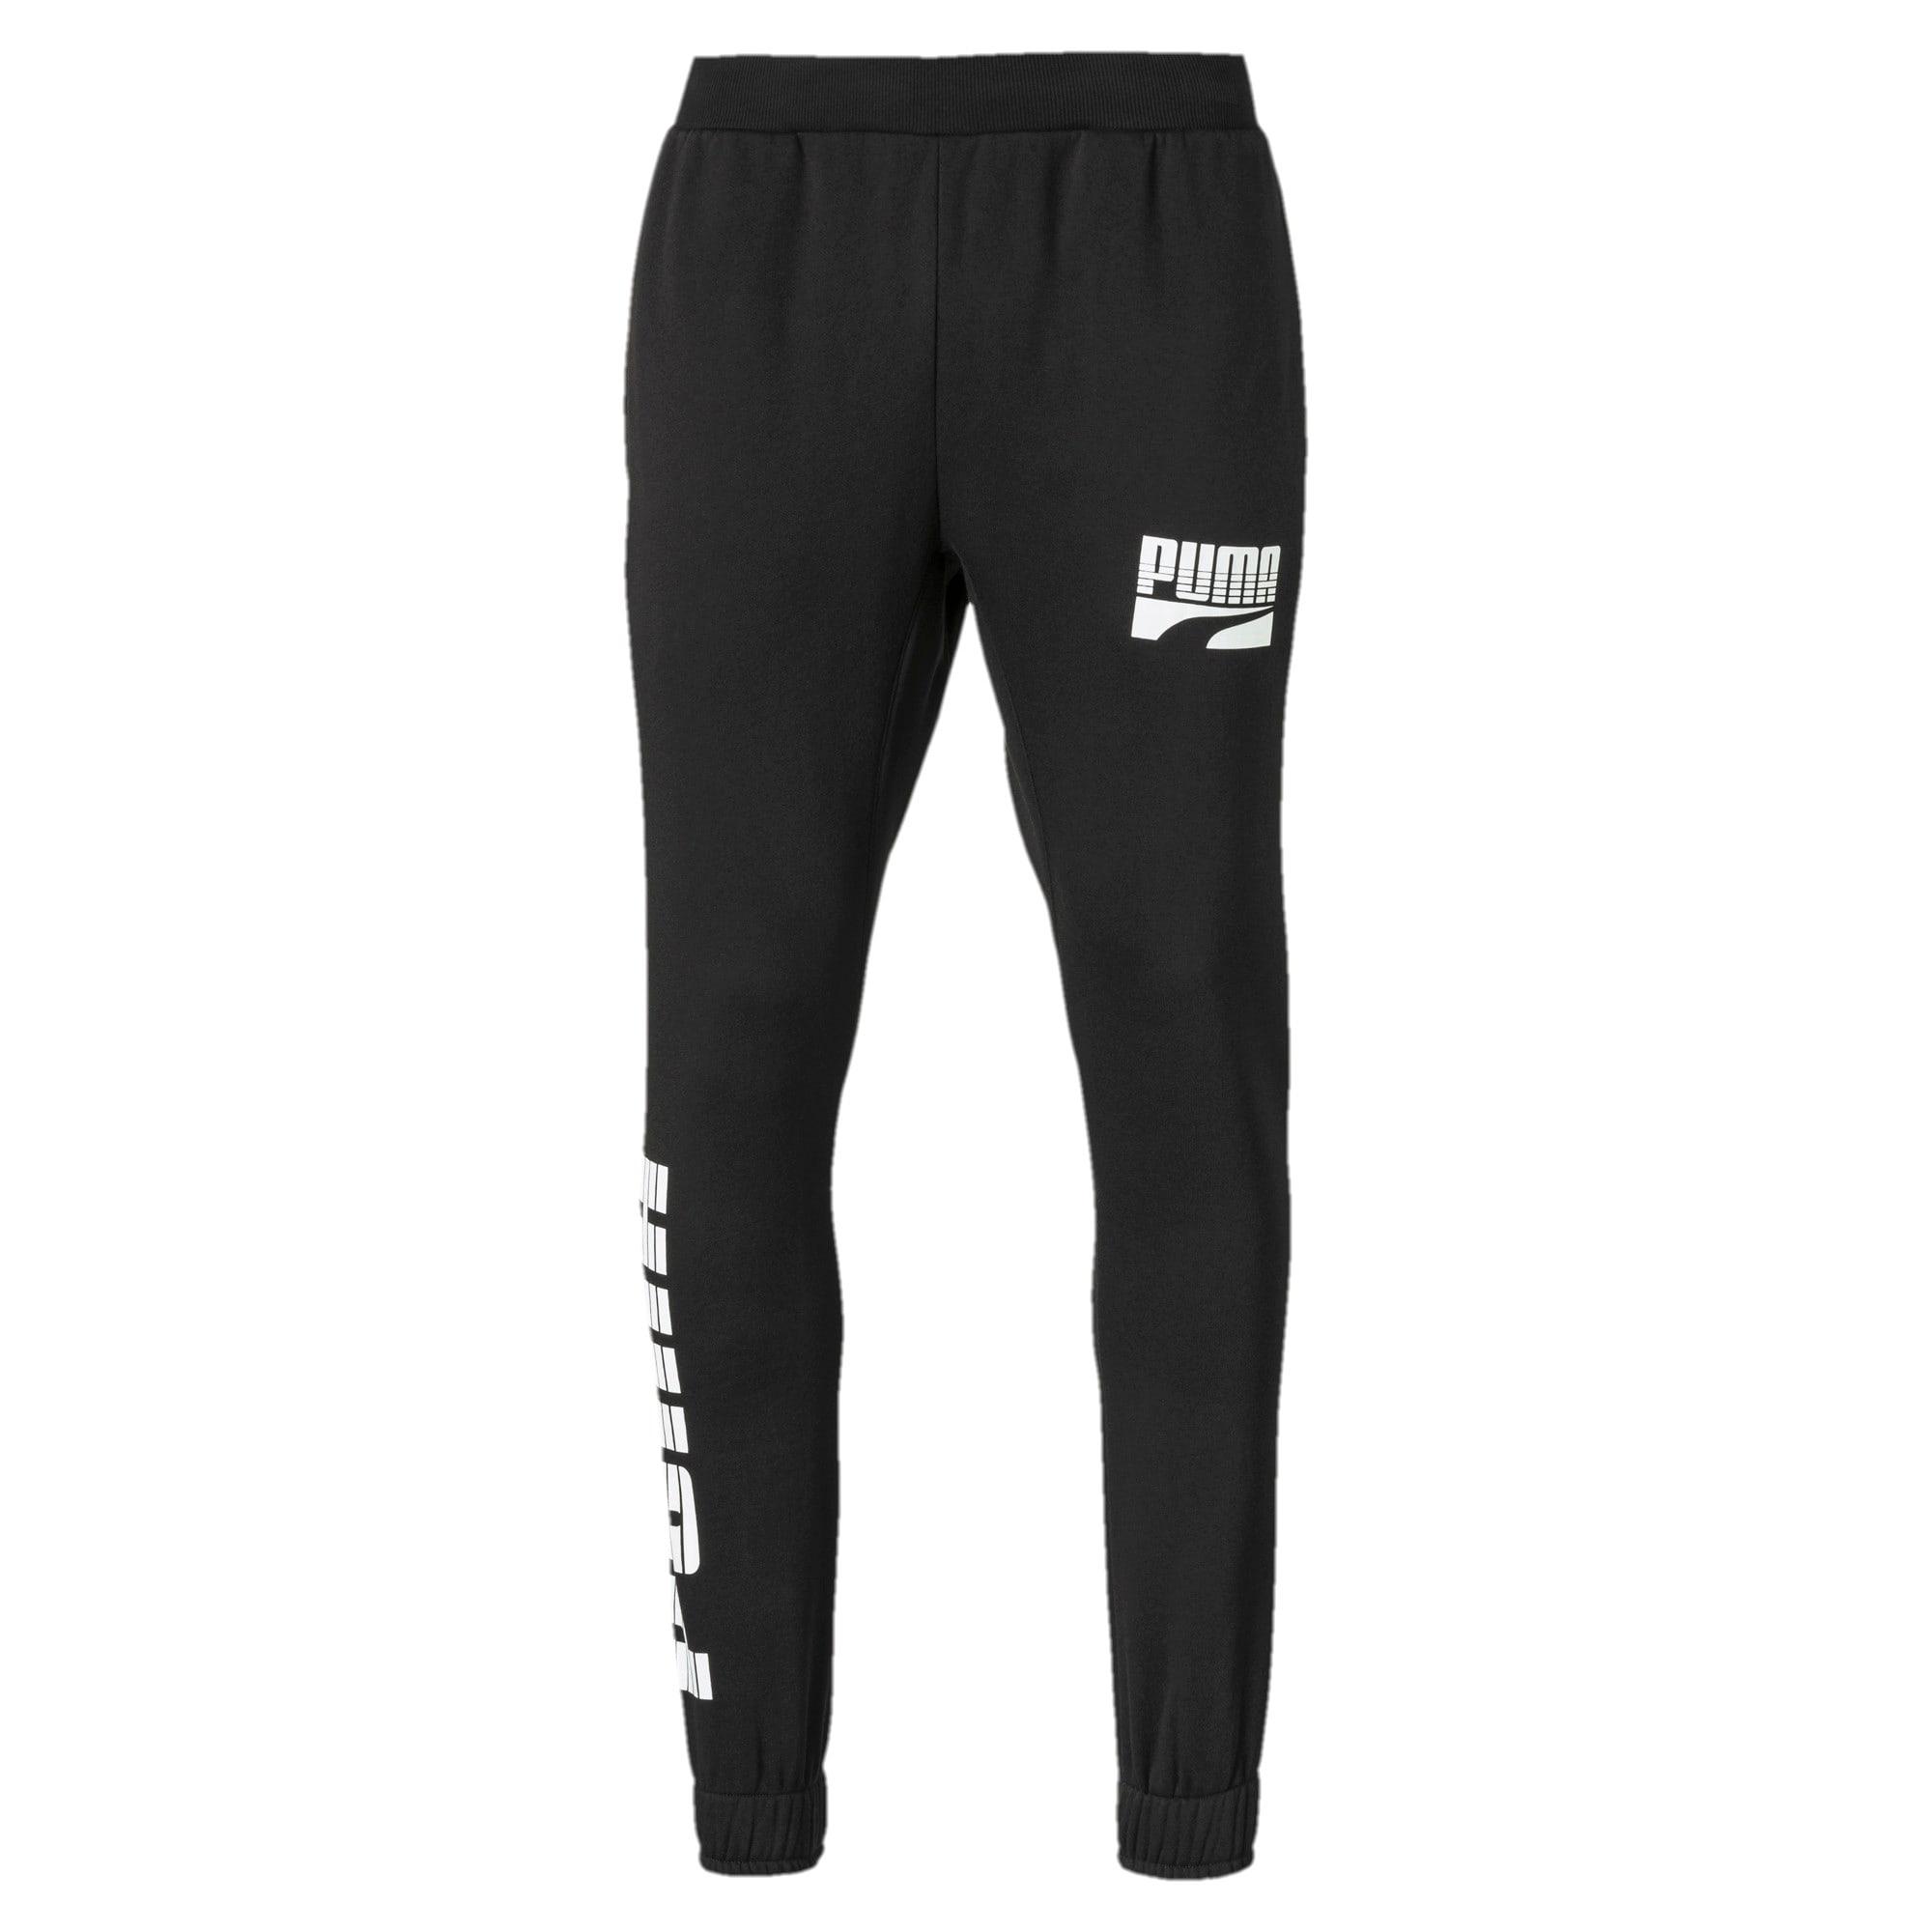 Thumbnail 1 of Rebel Bold Men's Pants, Puma Black, medium